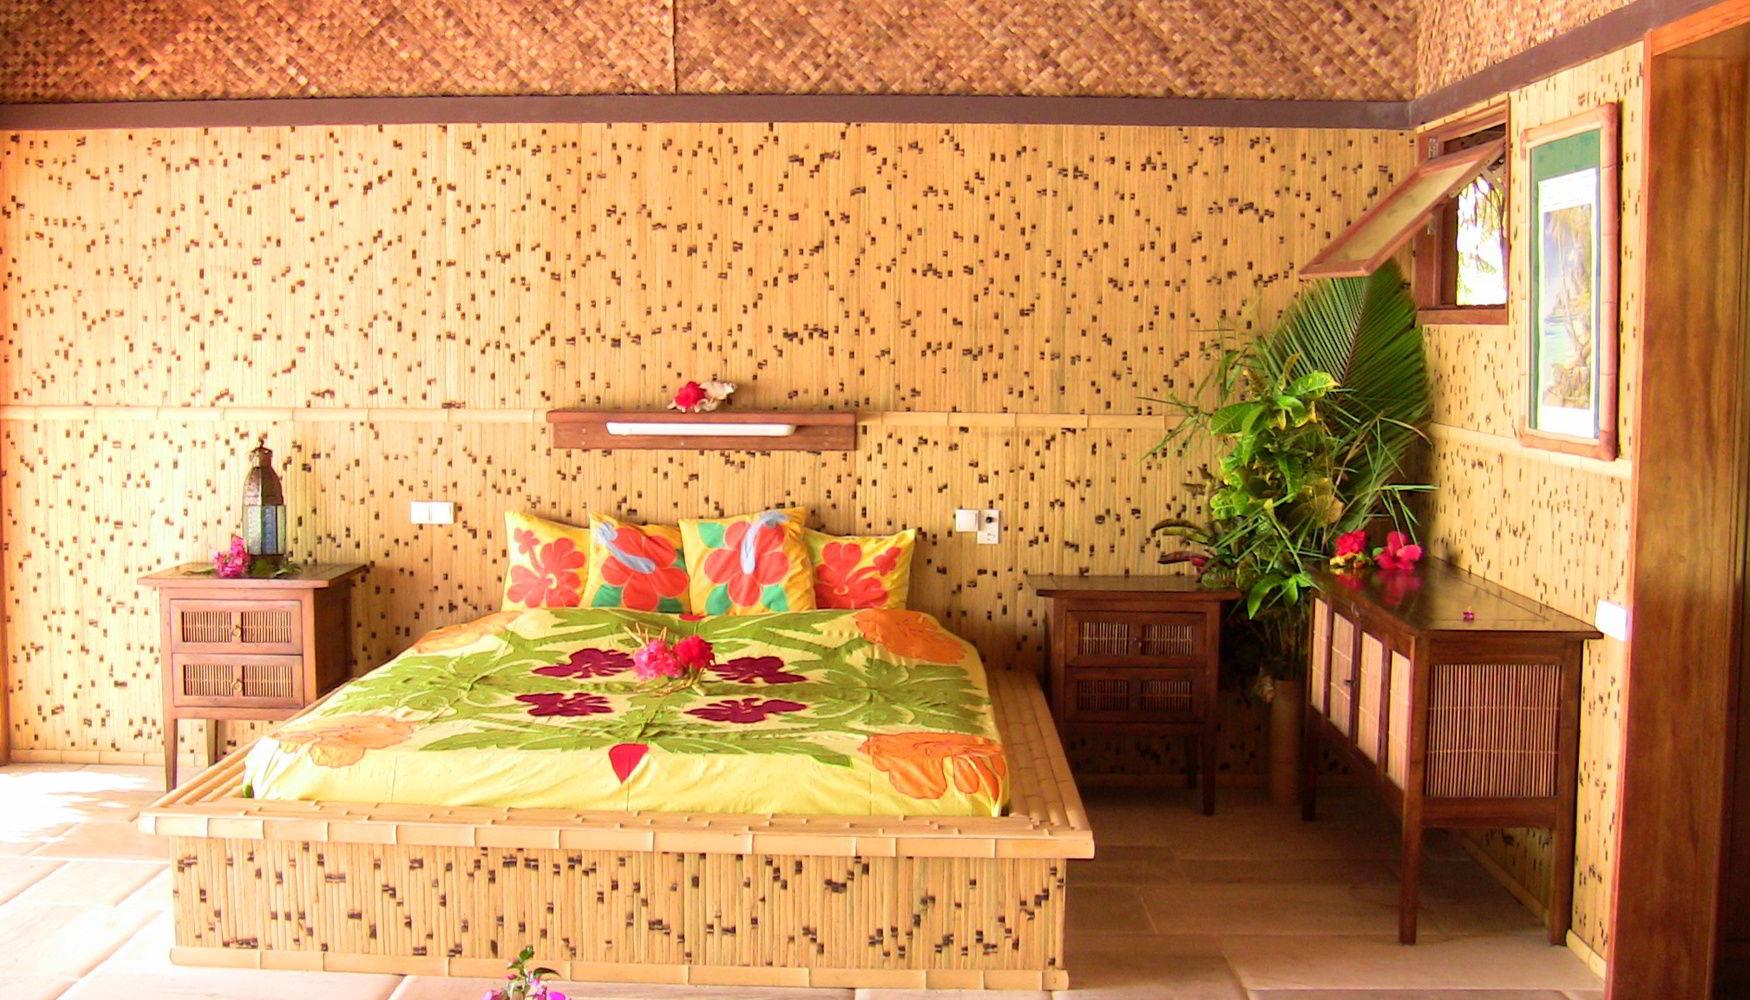 Interior of resort guest bungalow